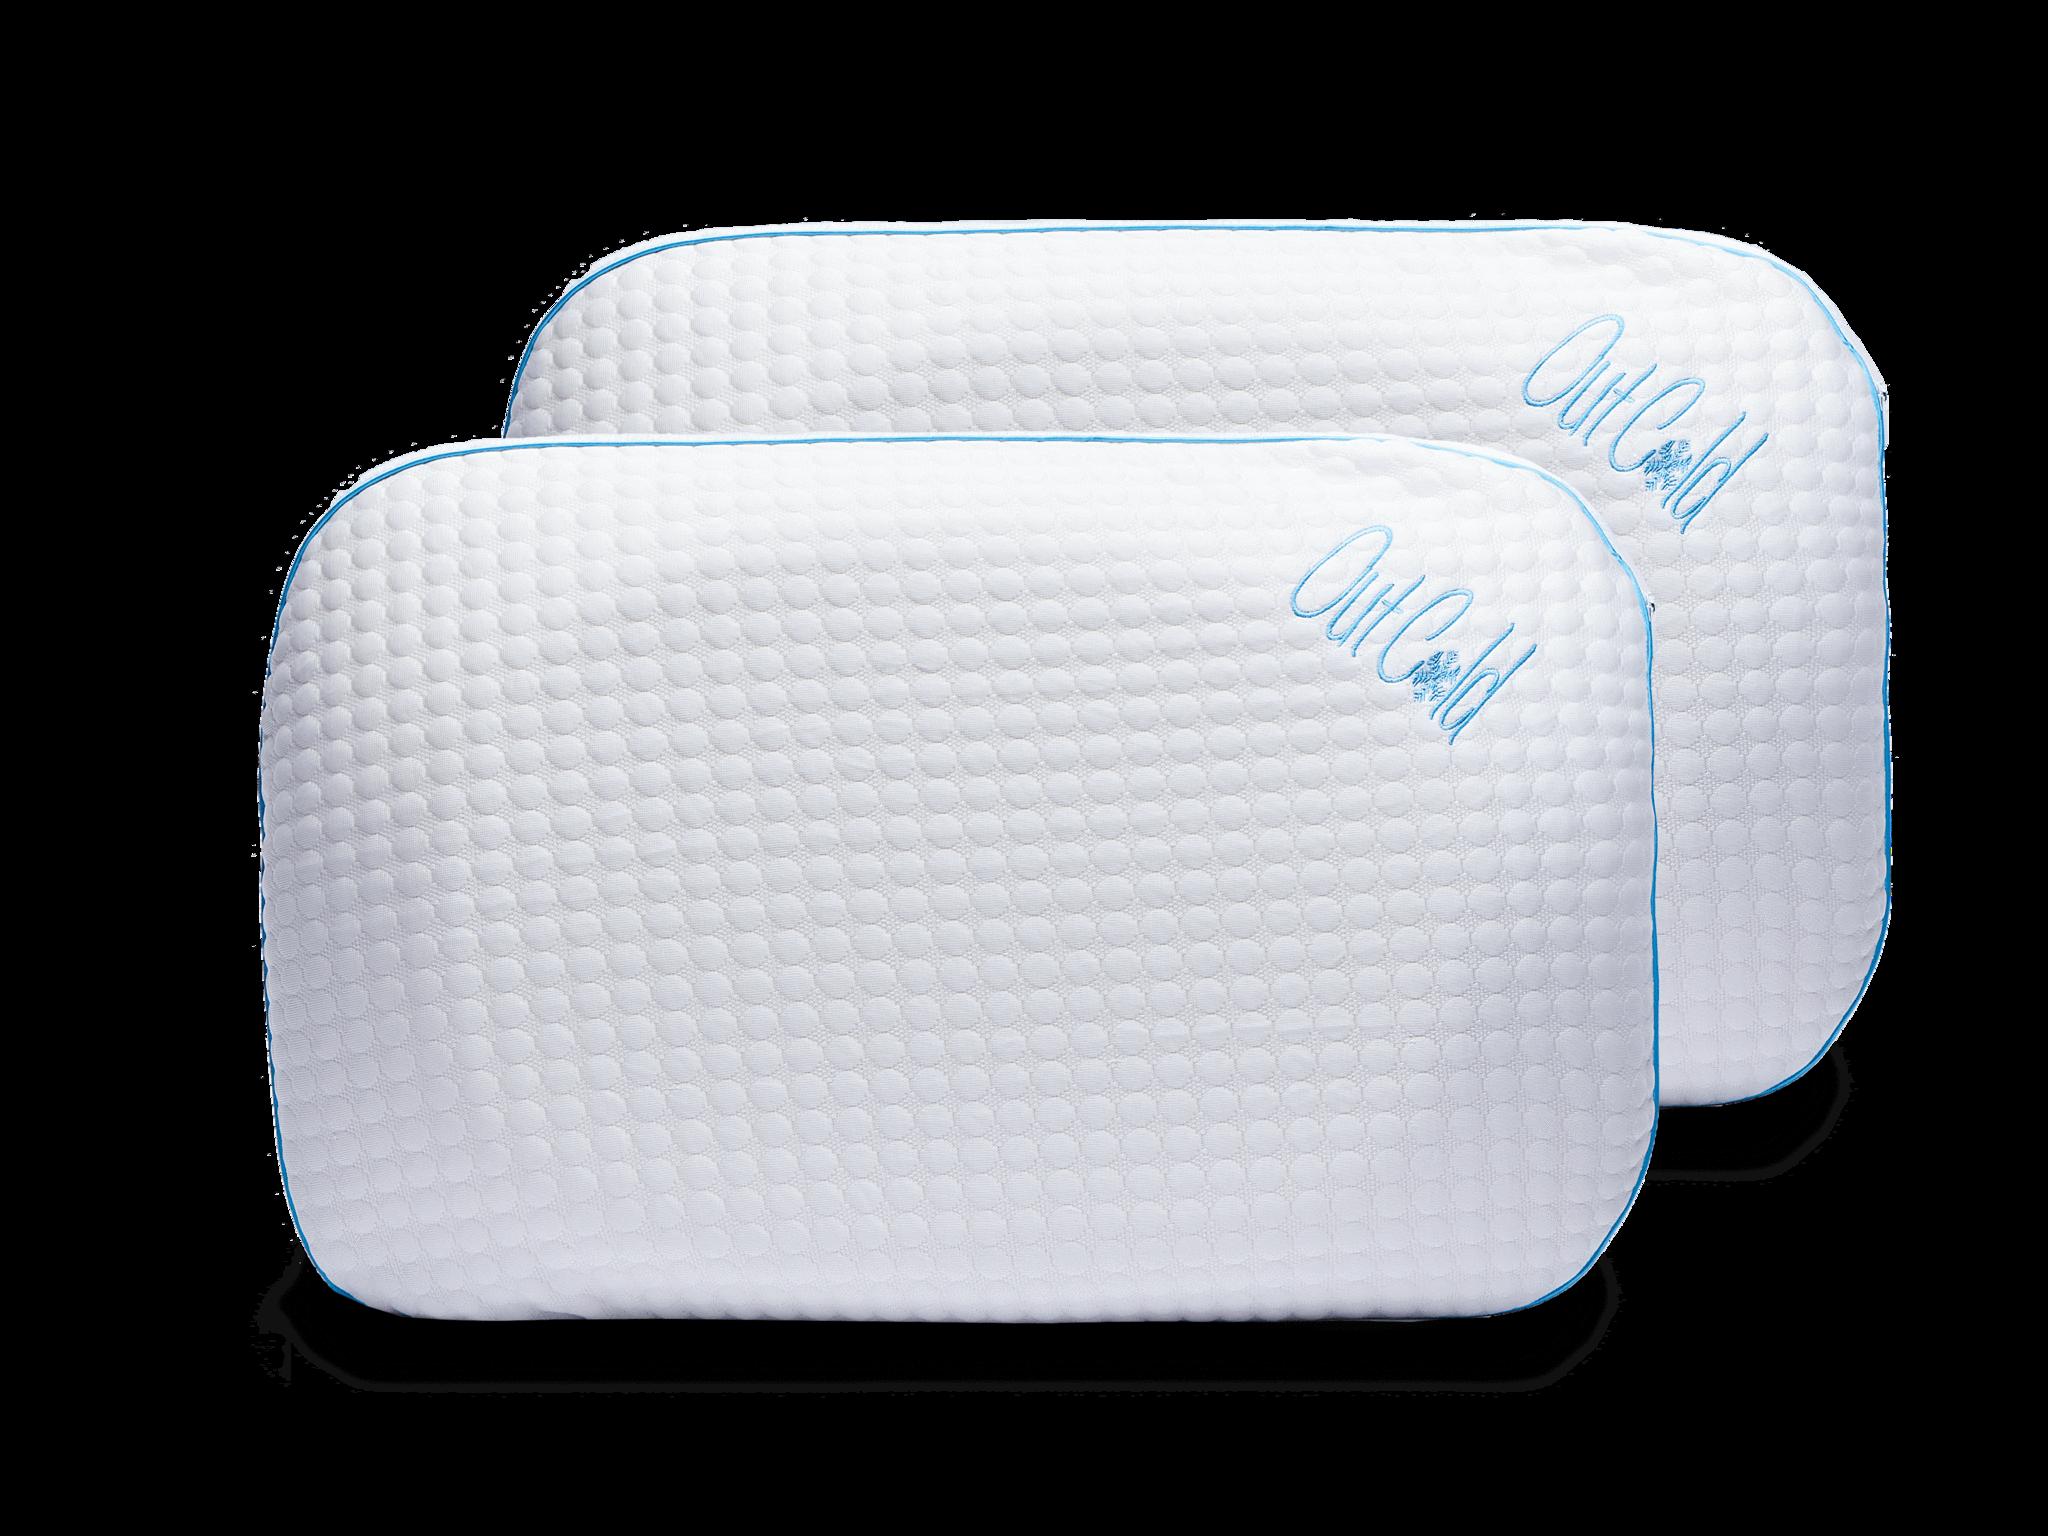 memory foam contour pillow made in america